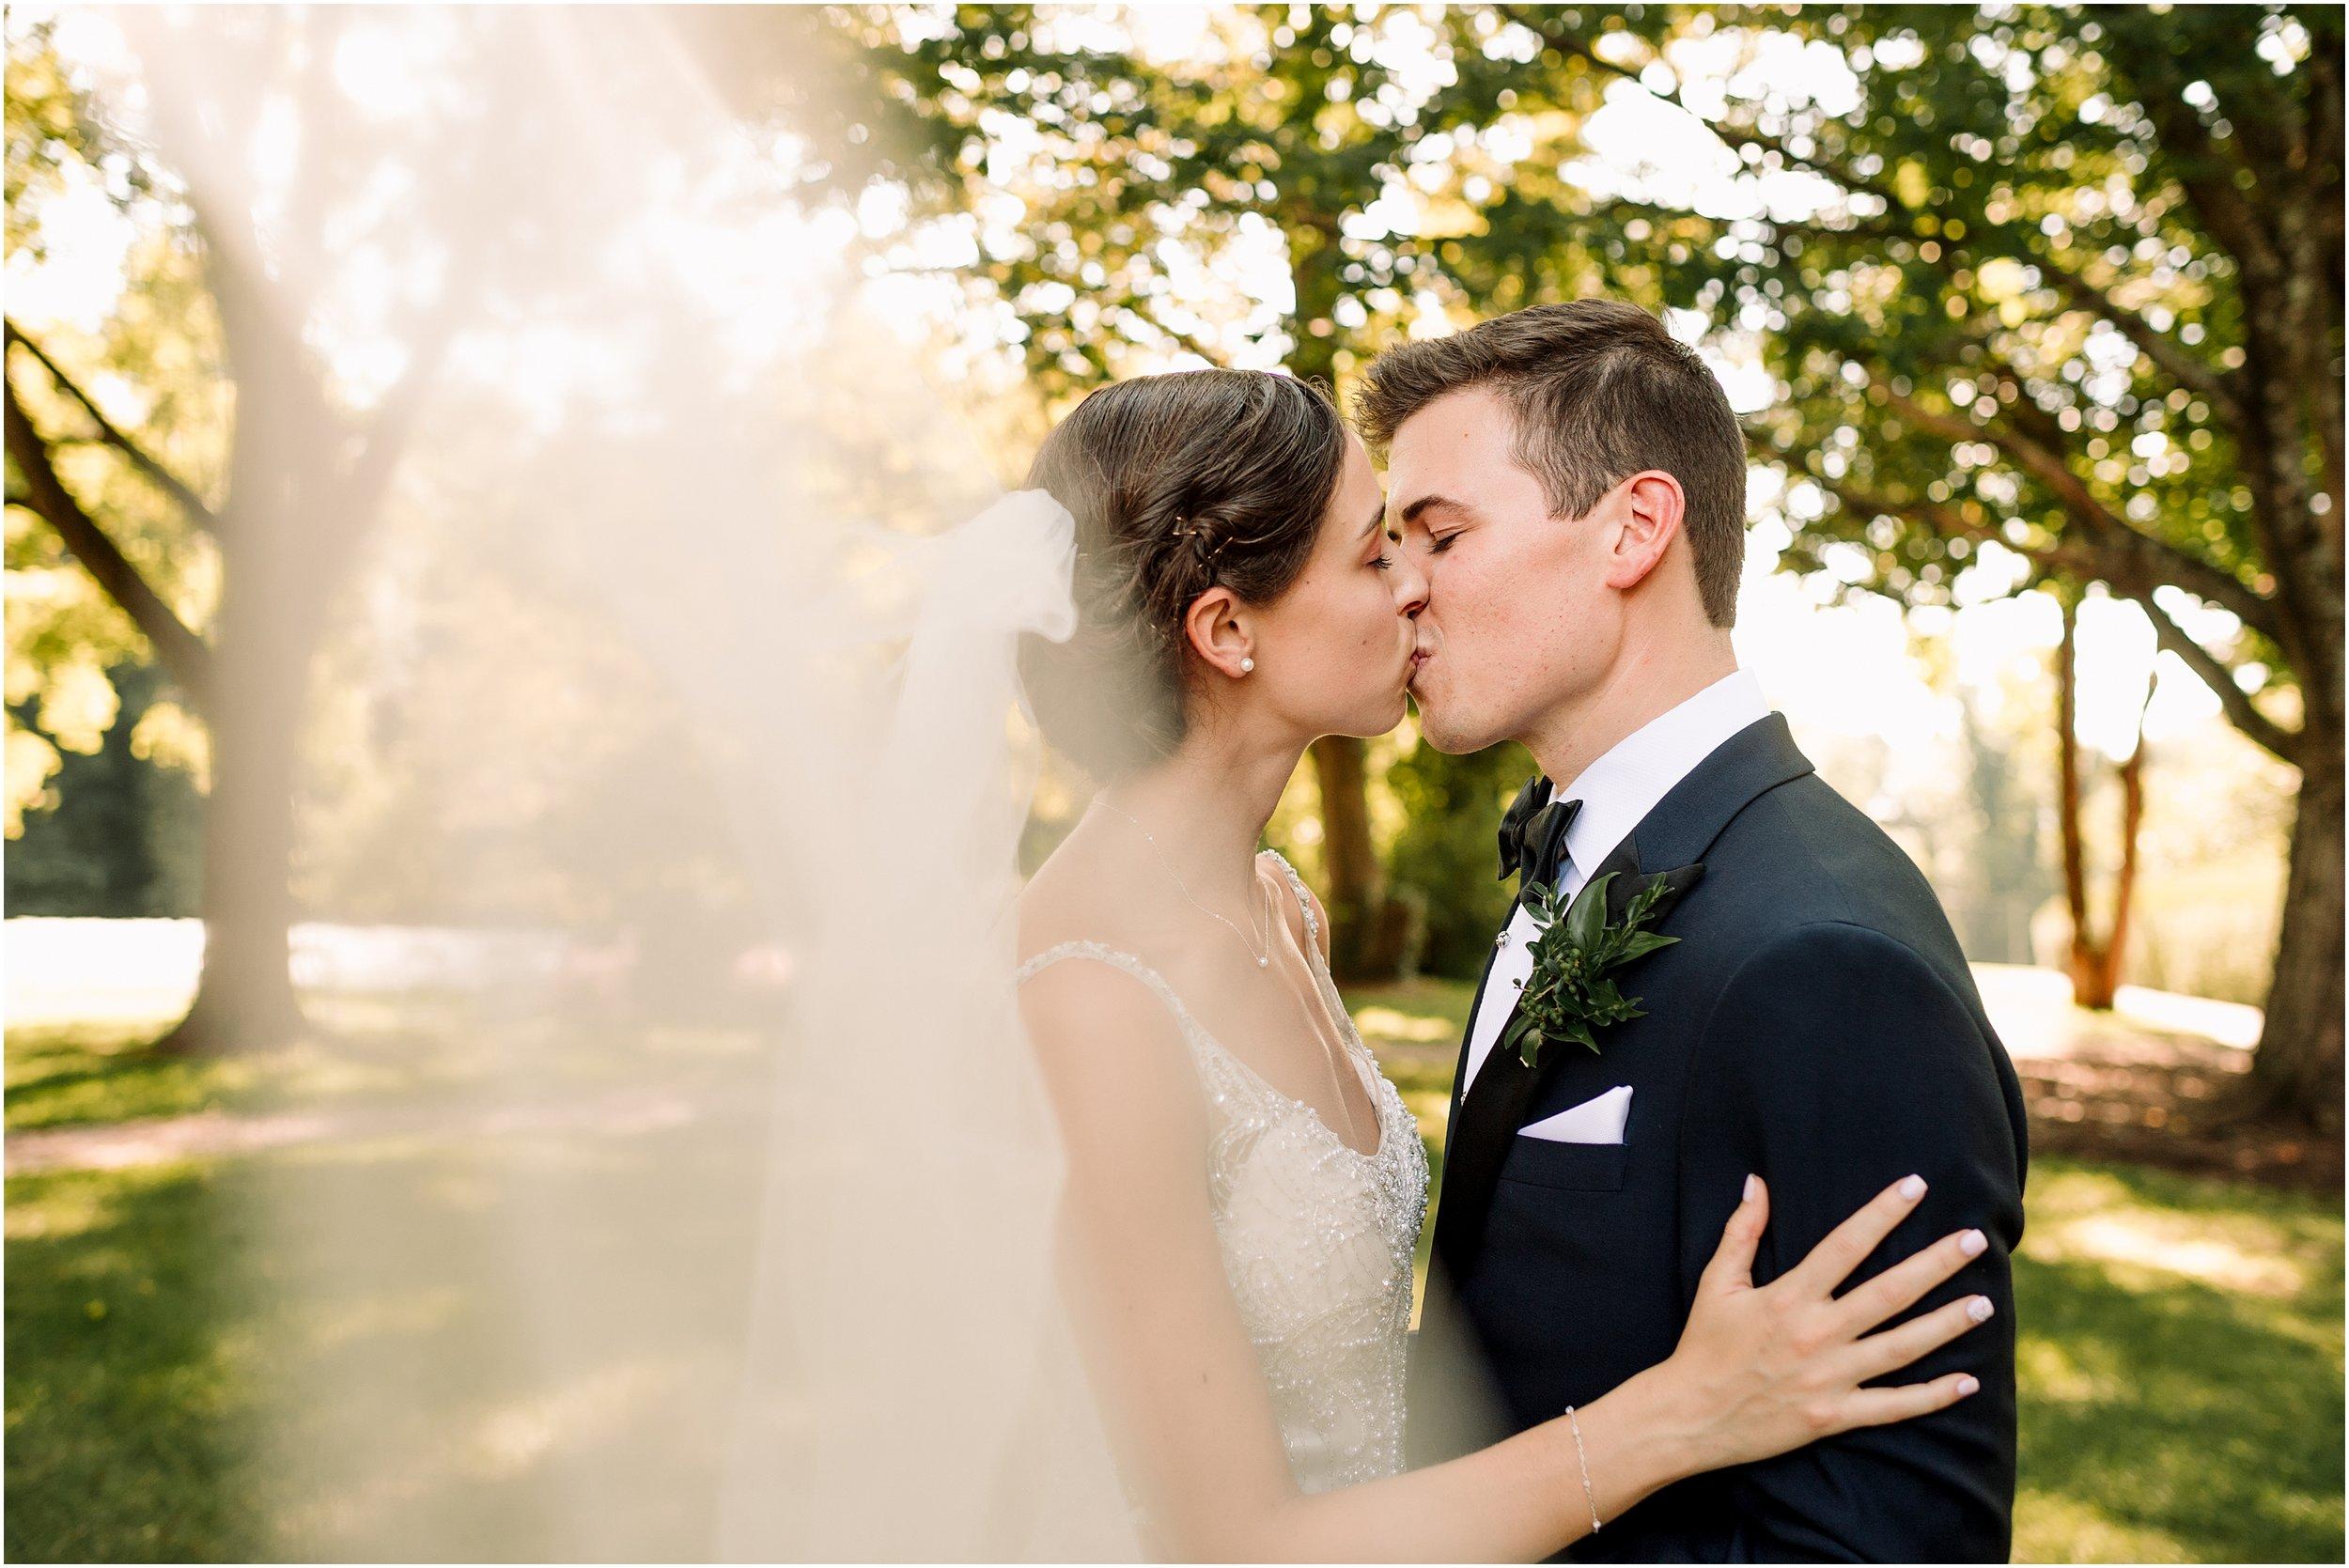 hannah leigh photography Antrim 1844 Wedding_1229.jpg